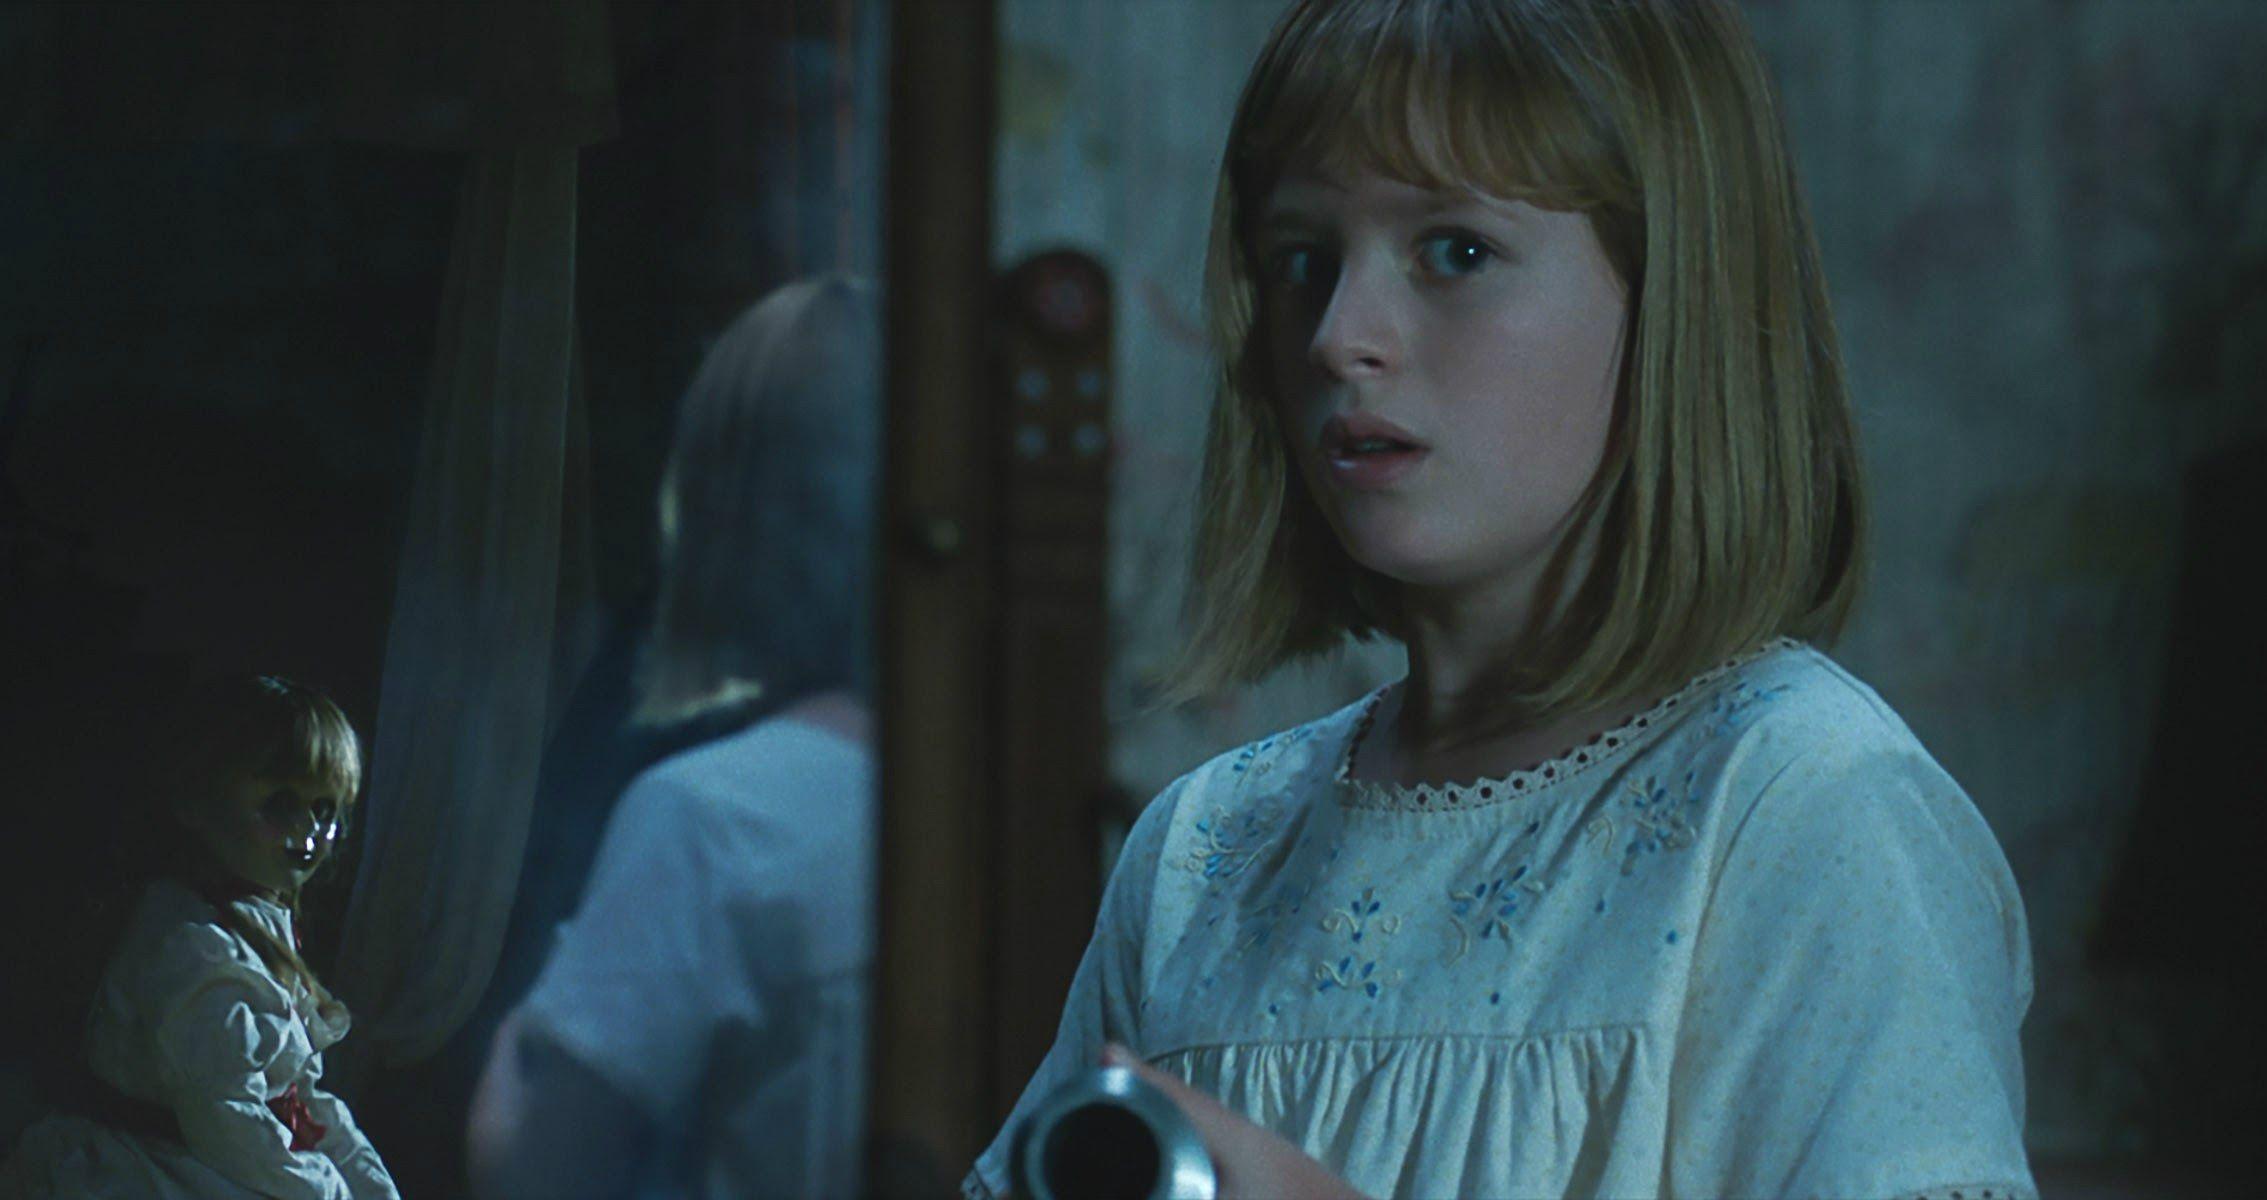 Warnerbros Released Scary Clips From David F Sandberg S New Horror Film Annabelle Creation Starring Talithabateman Luluwilson ゾッと 子役 ホラー クリエイション